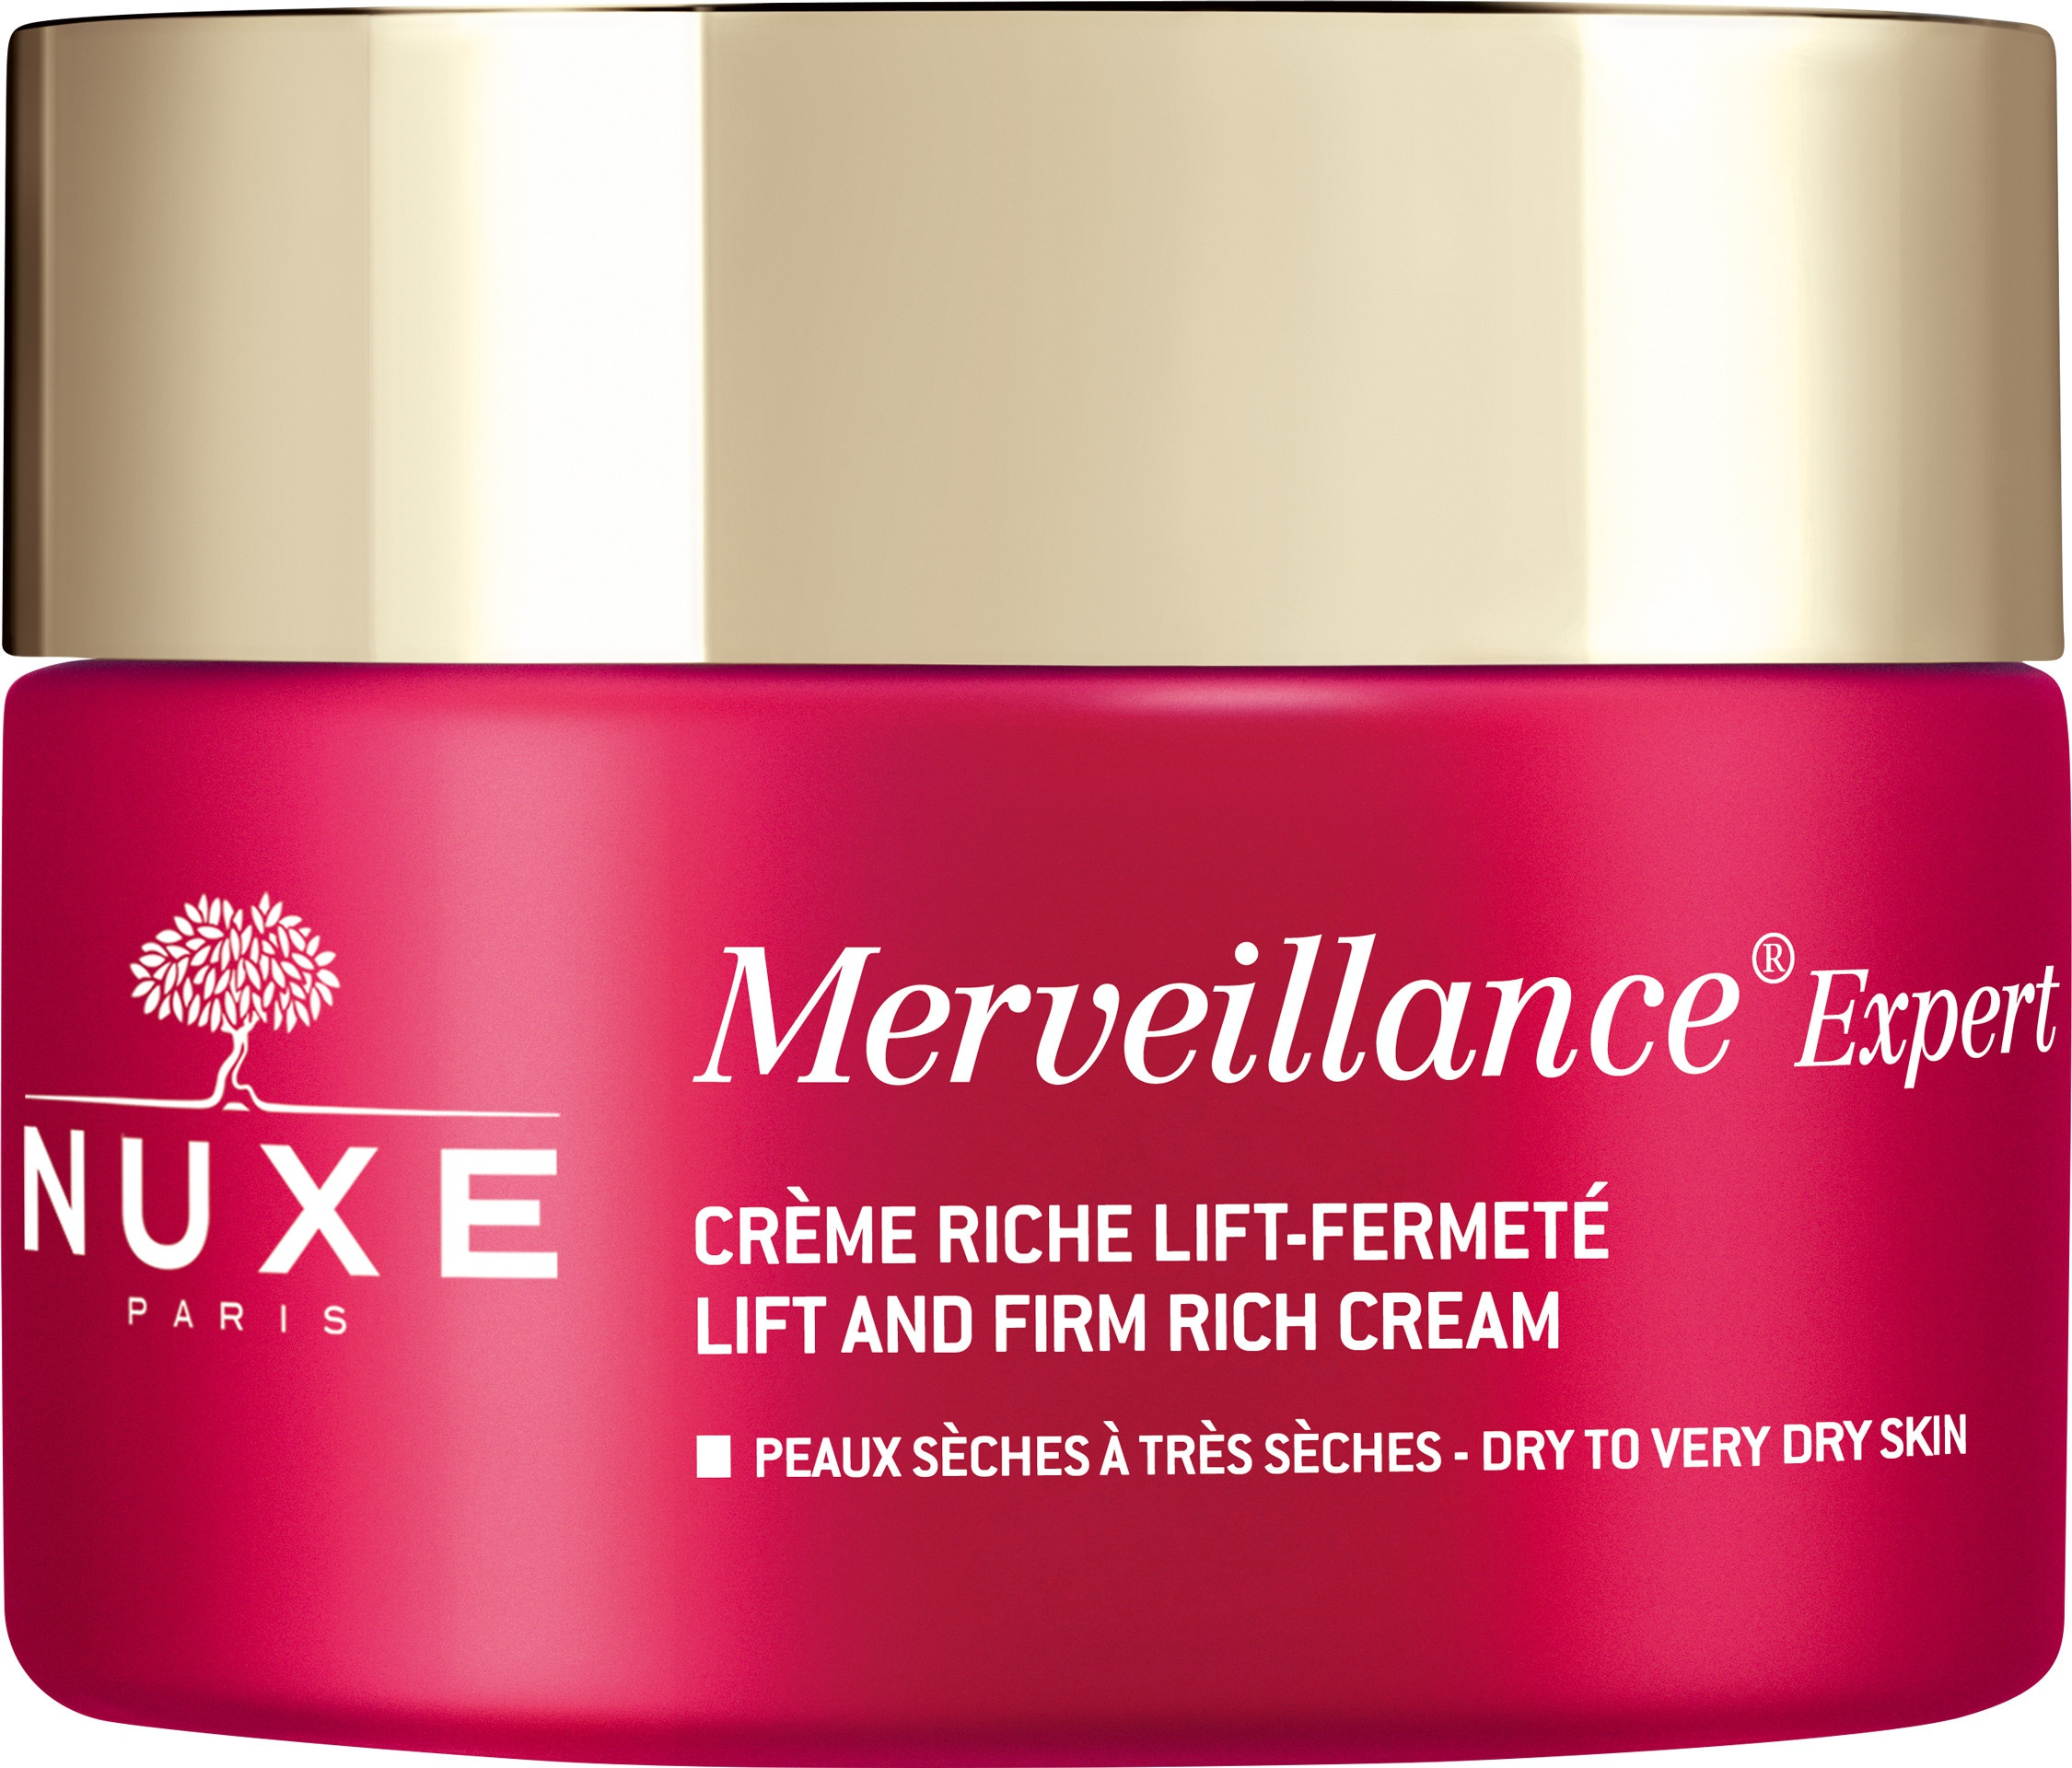 Nuxe Merveillance Expert Lift & Firm Rich Night Cream Dry To Very Dry Skin